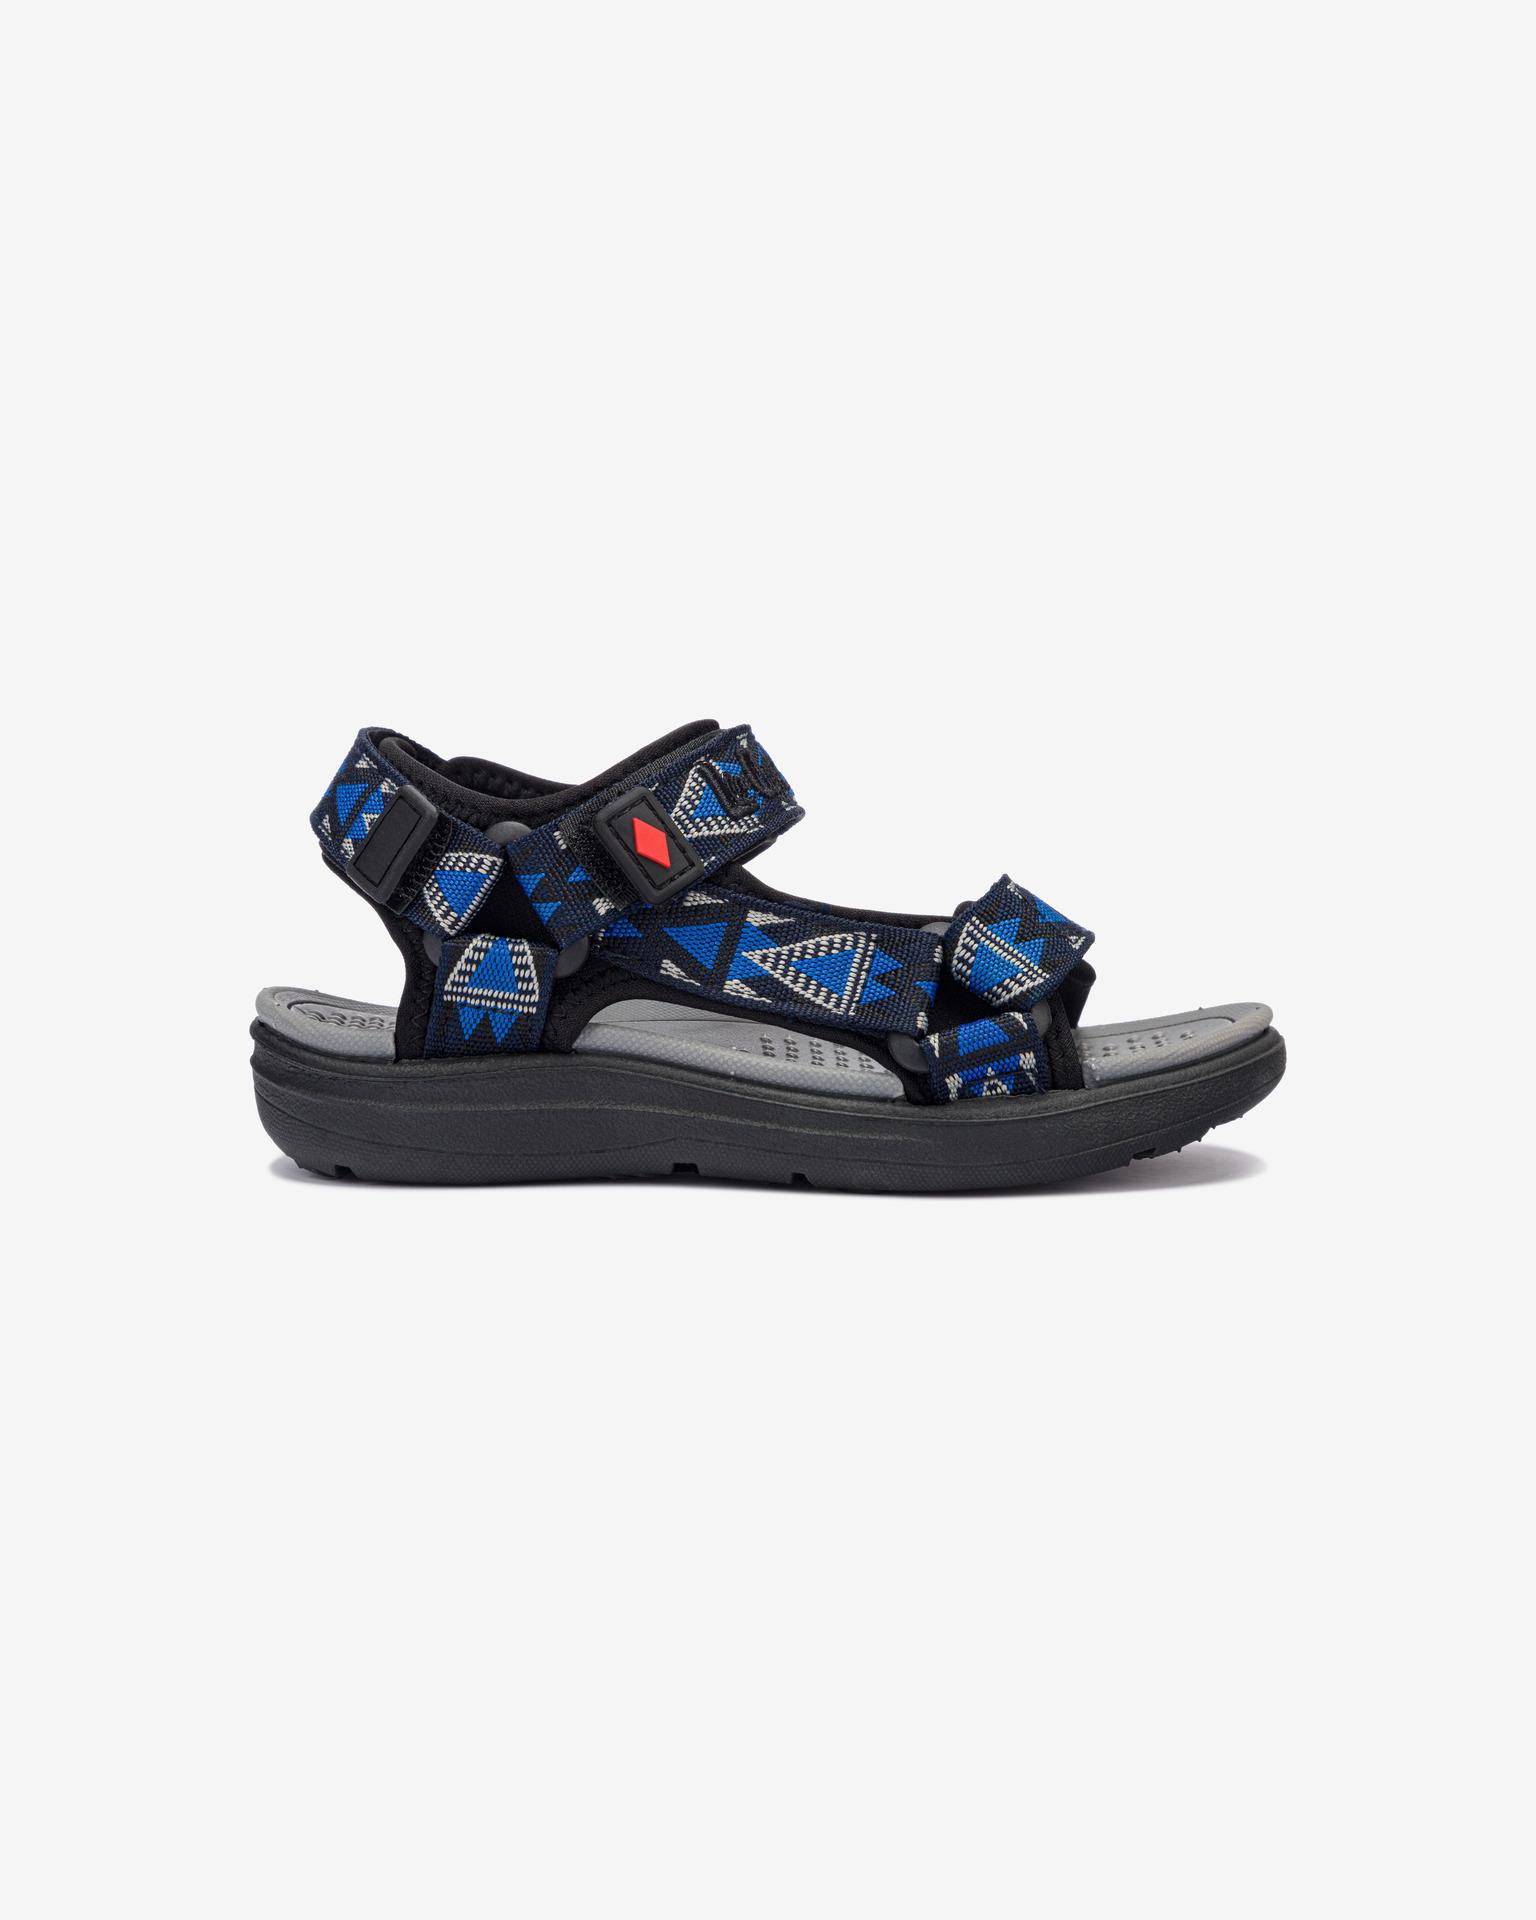 Lee Cooper Outdoor sandále detské Modrá - 30